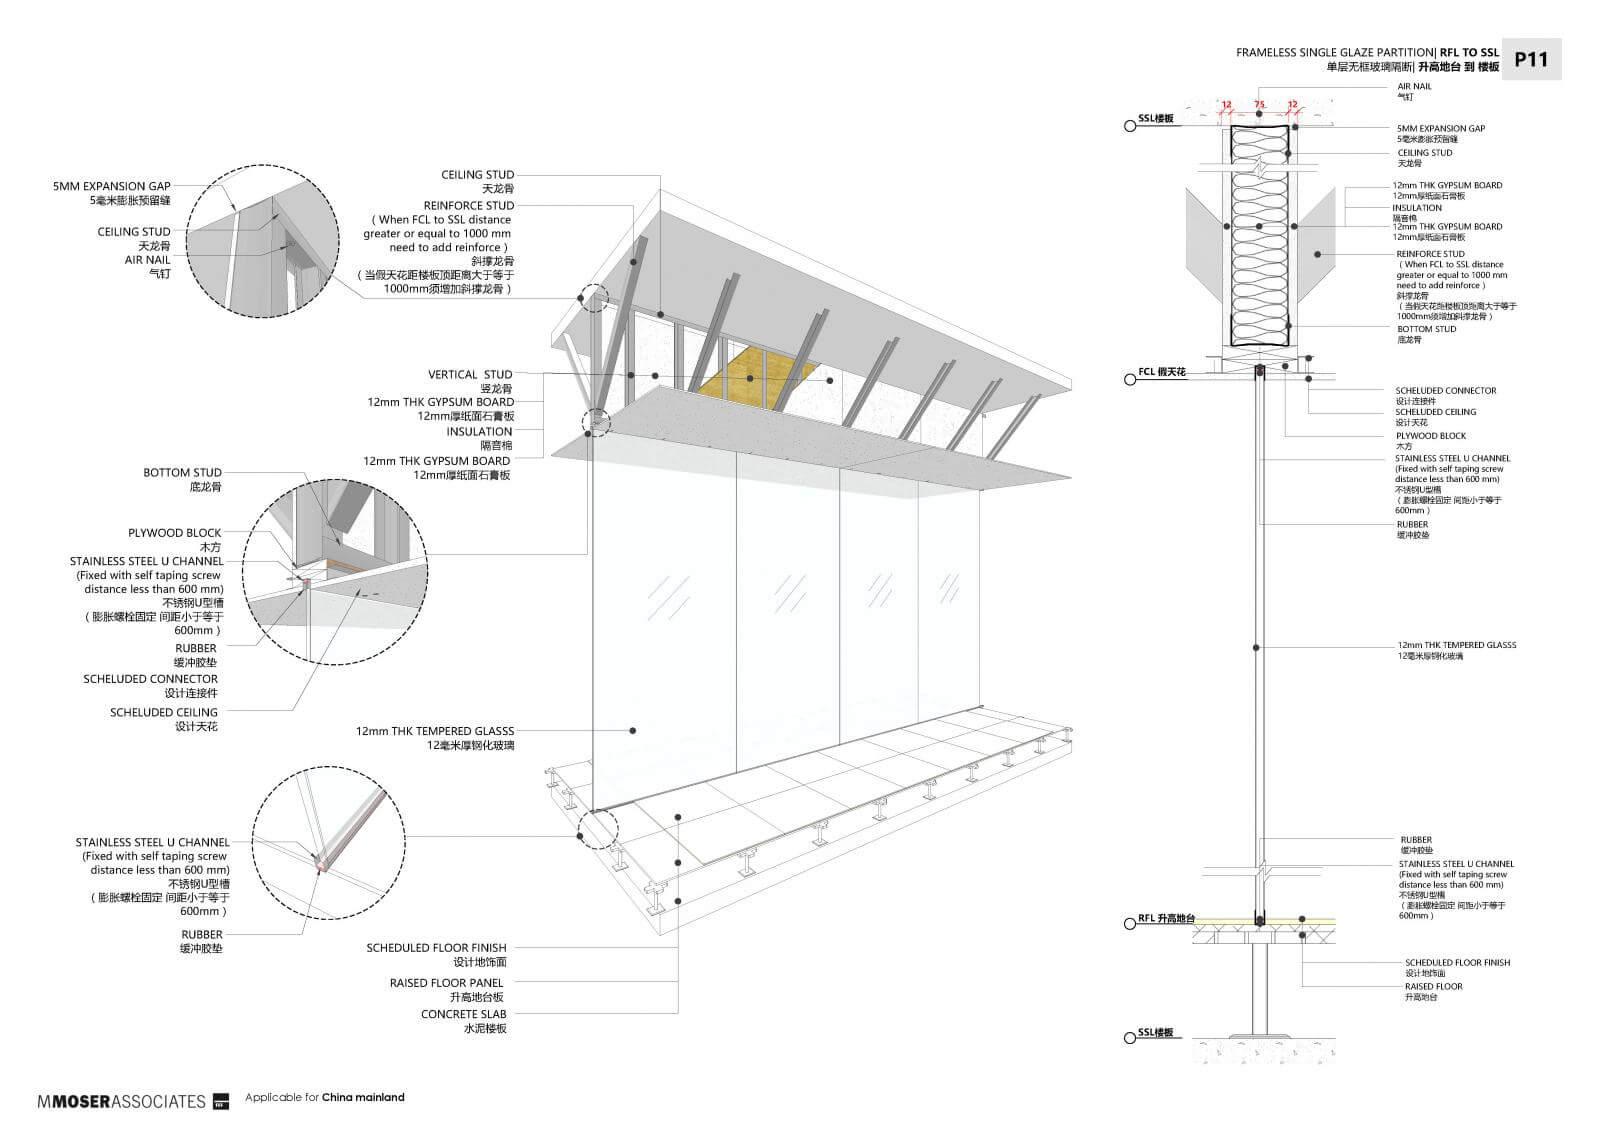 gabster-imagem-metodo-construtivo-virtual-layout-detalhamento-modelado